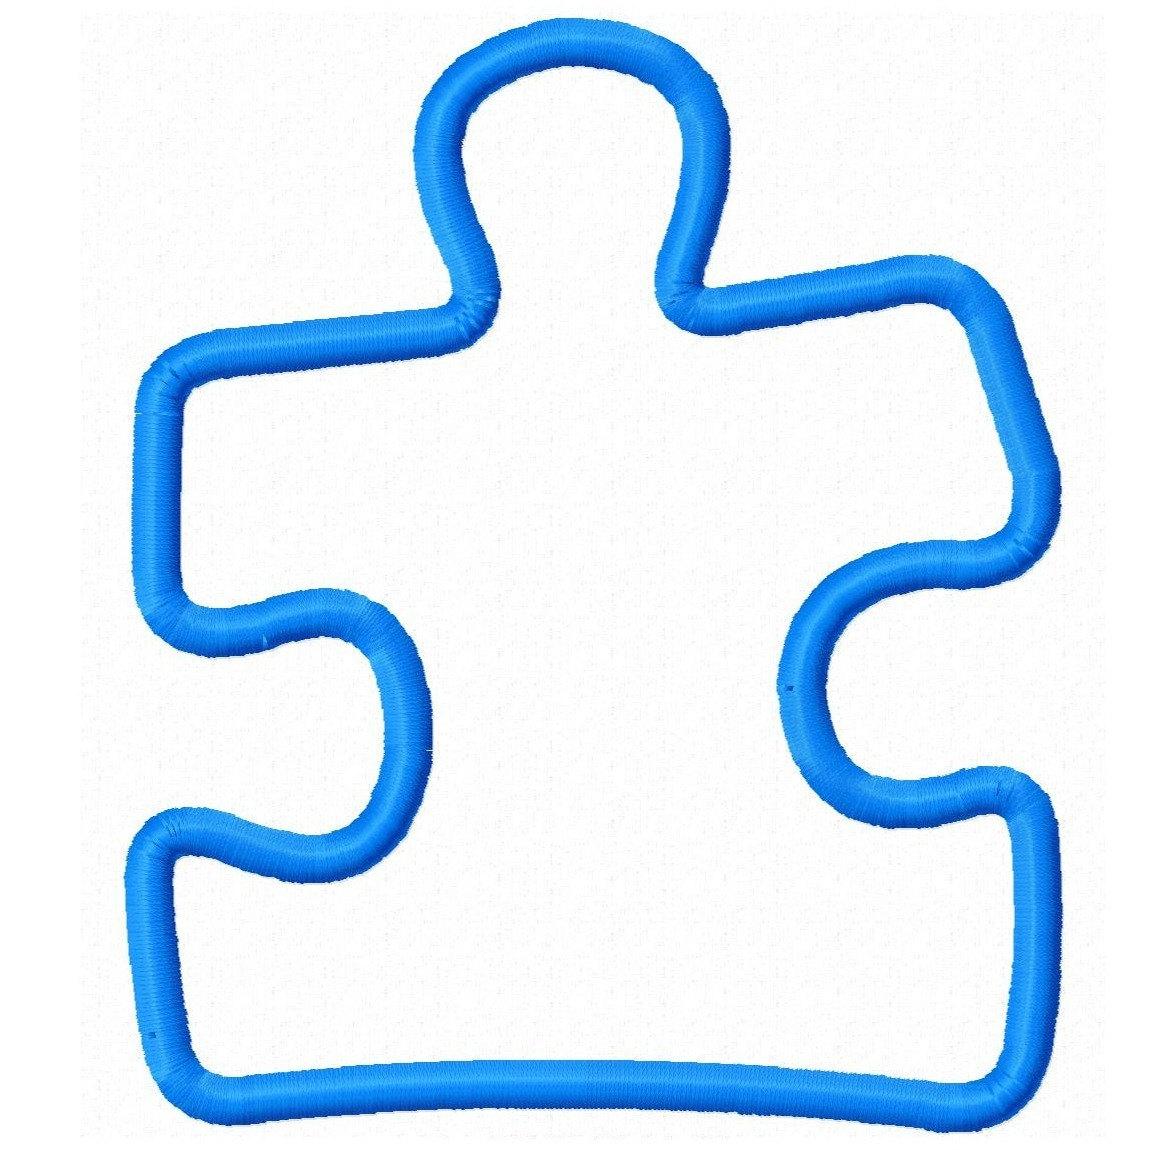 Puzzle Pieces Outline   Free Download Best Puzzle Pieces Outline On - Free Printable Autism Puzzle Piece